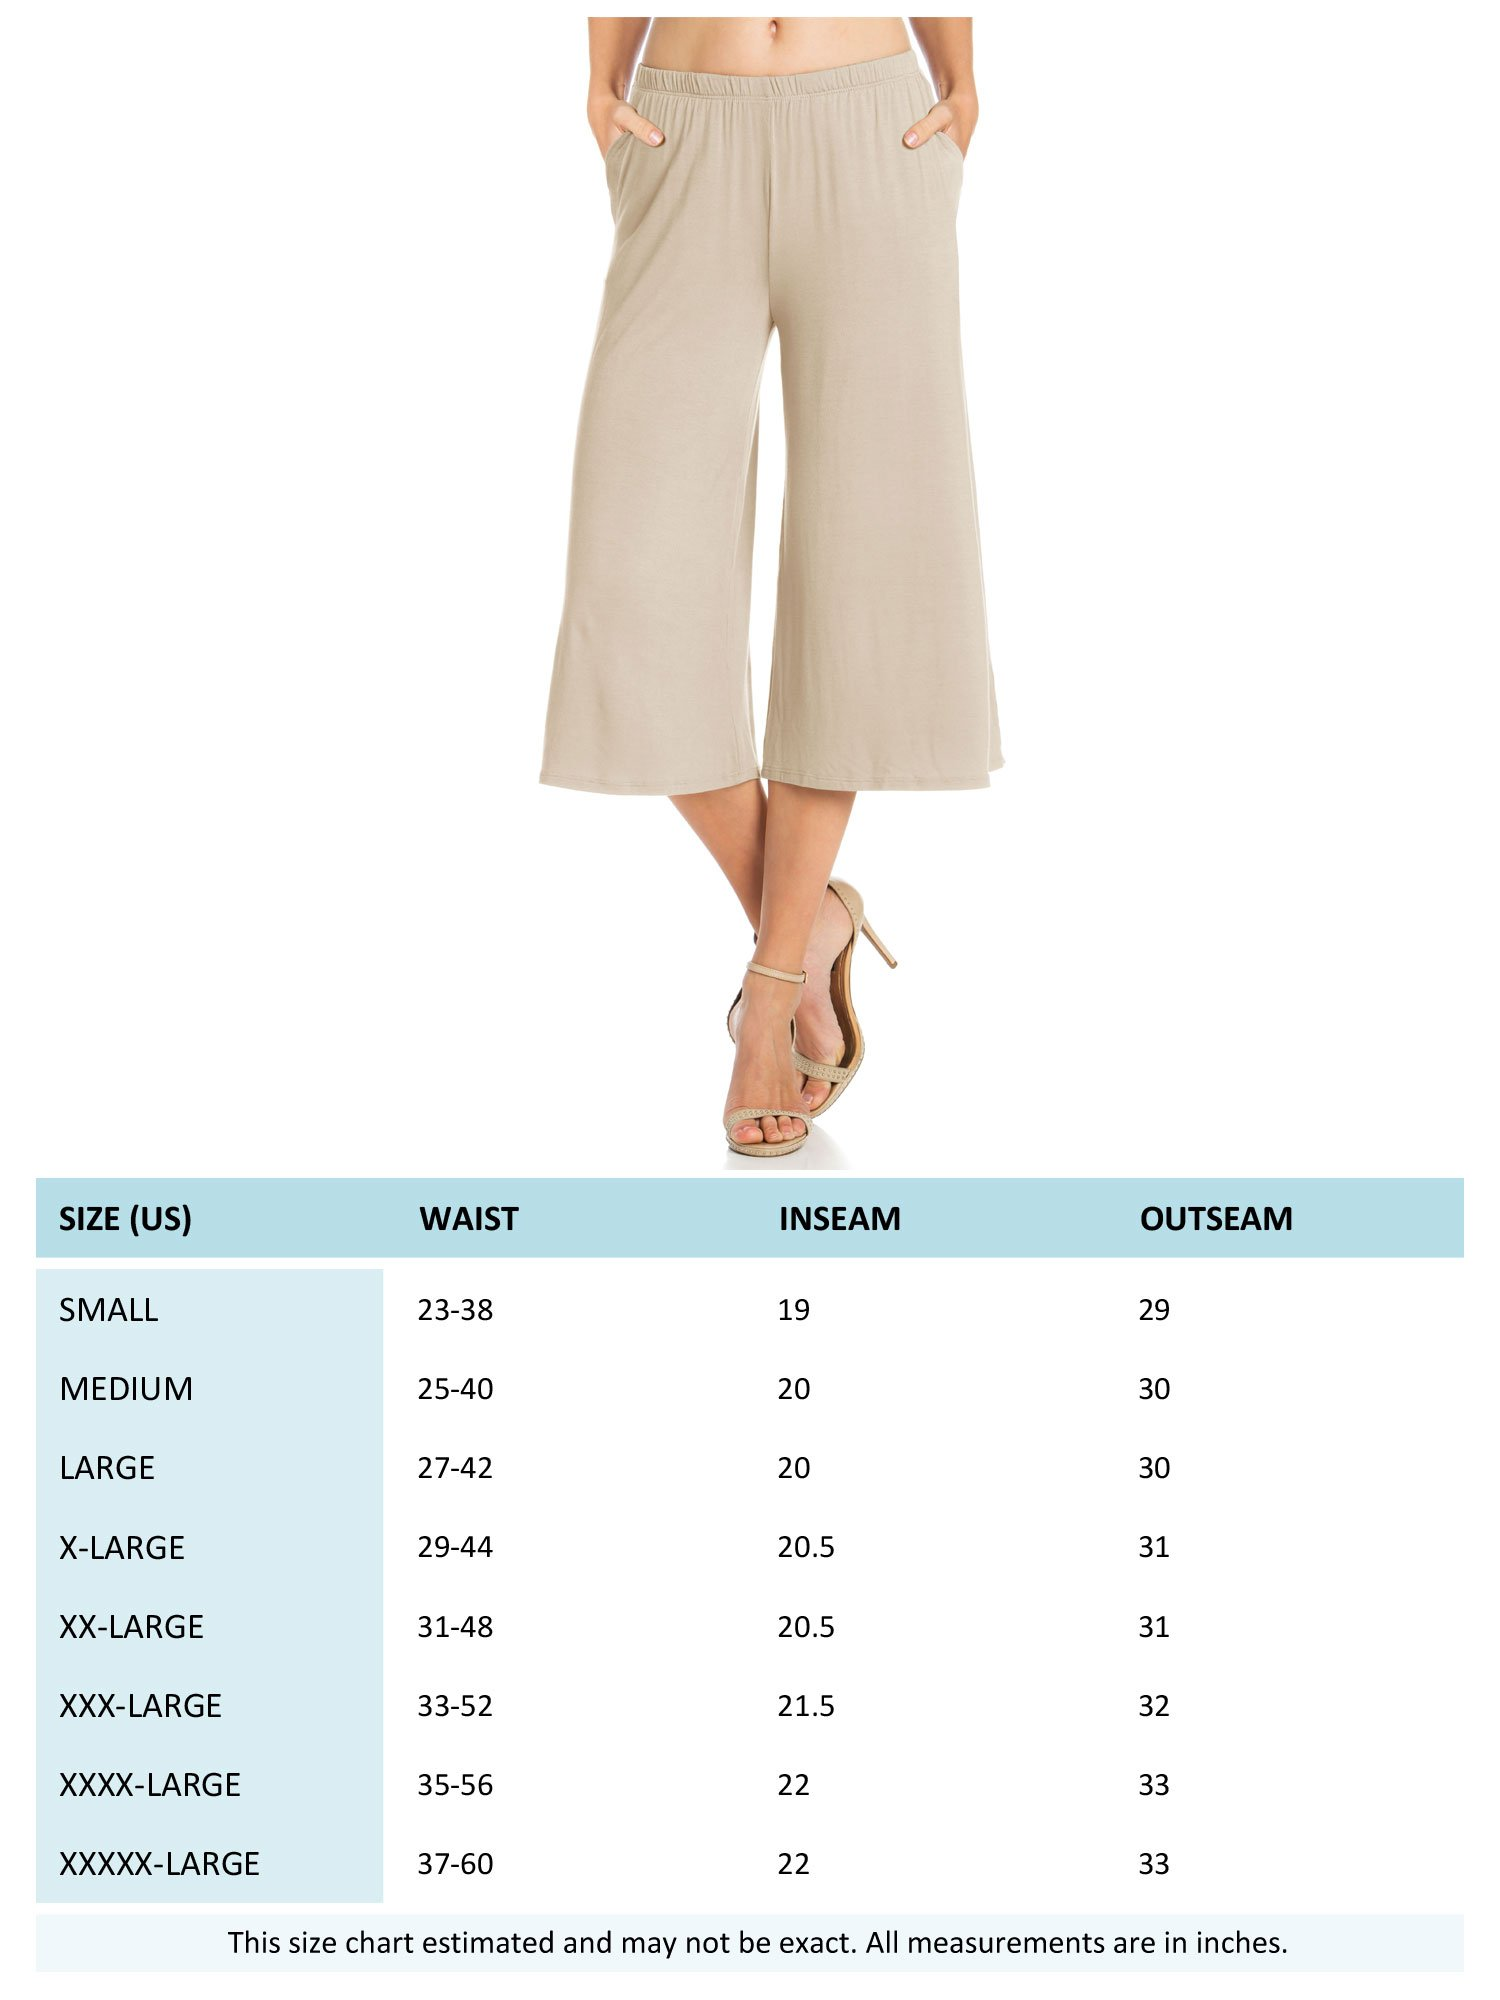 Fashion California Womens 1 Pack Elastic Waist Jersey Culottes Capri Pocket Pants (XXXXX-Large, Aqua) by Fashion California (Image #6)